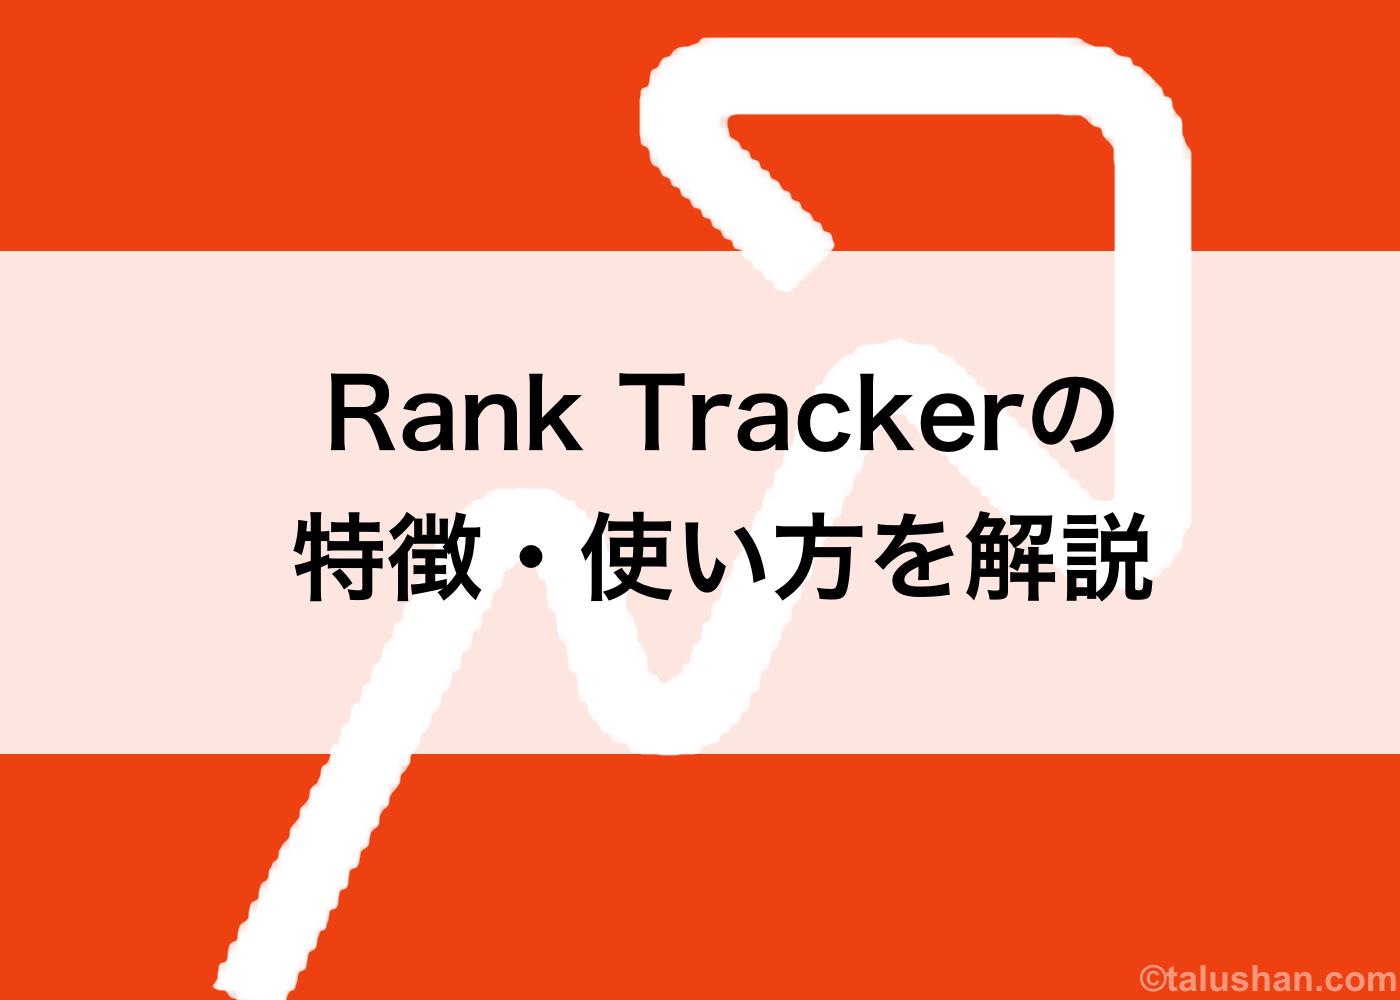 Rank Tracker(ランクトラッカー)の特徴・使い方を解説